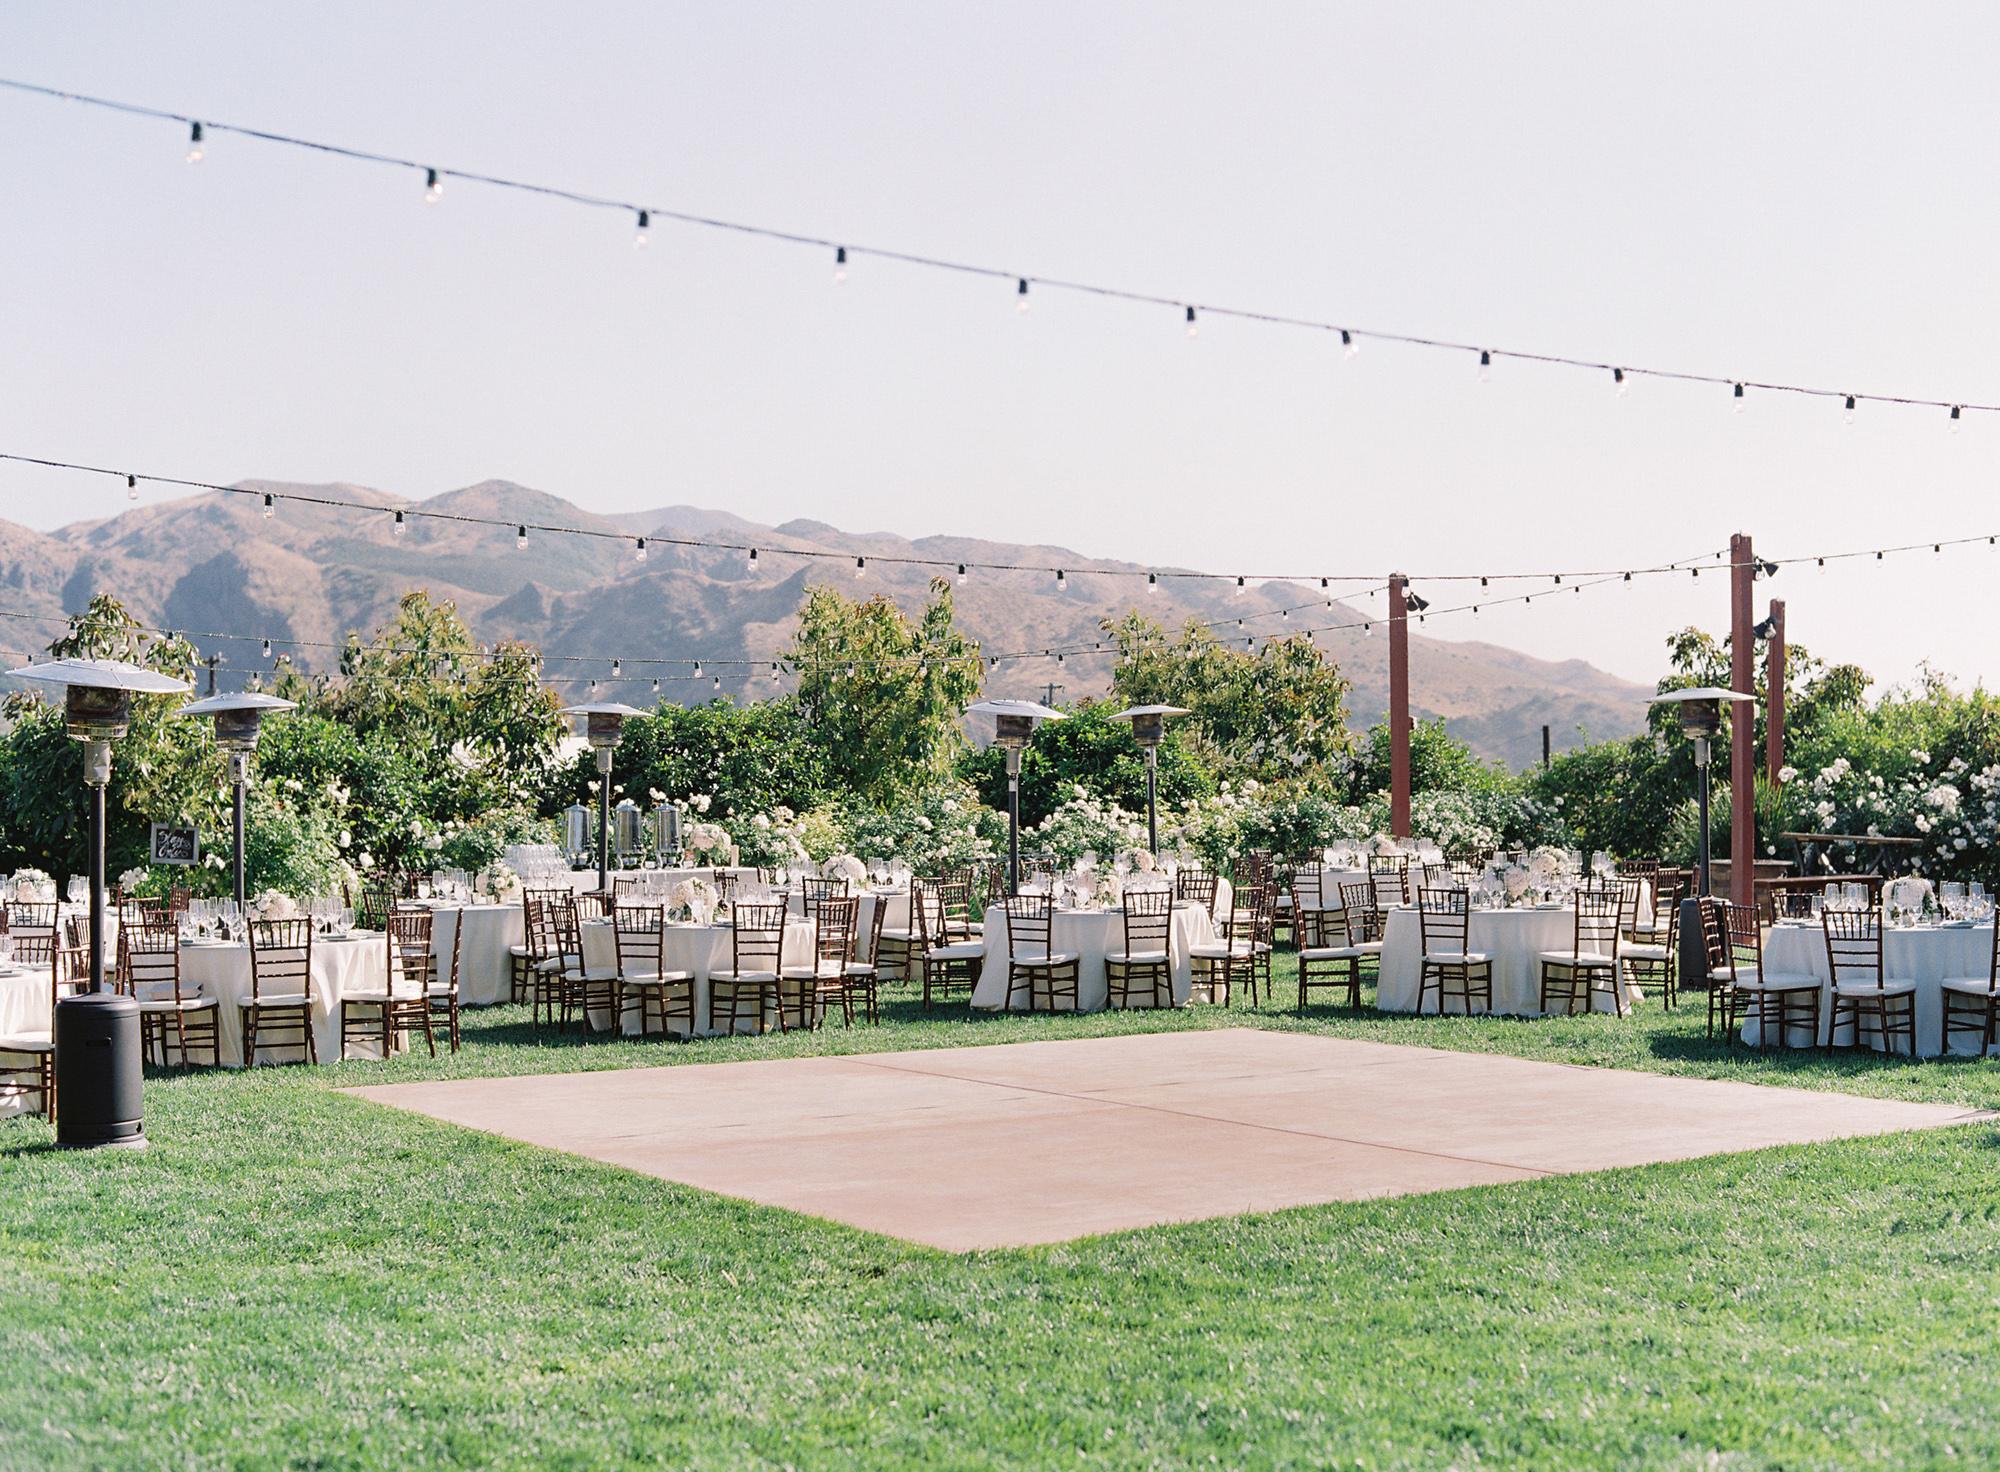 Gerry-Ranch-Wedding-Photography-Kristina-Adams-21.jpg